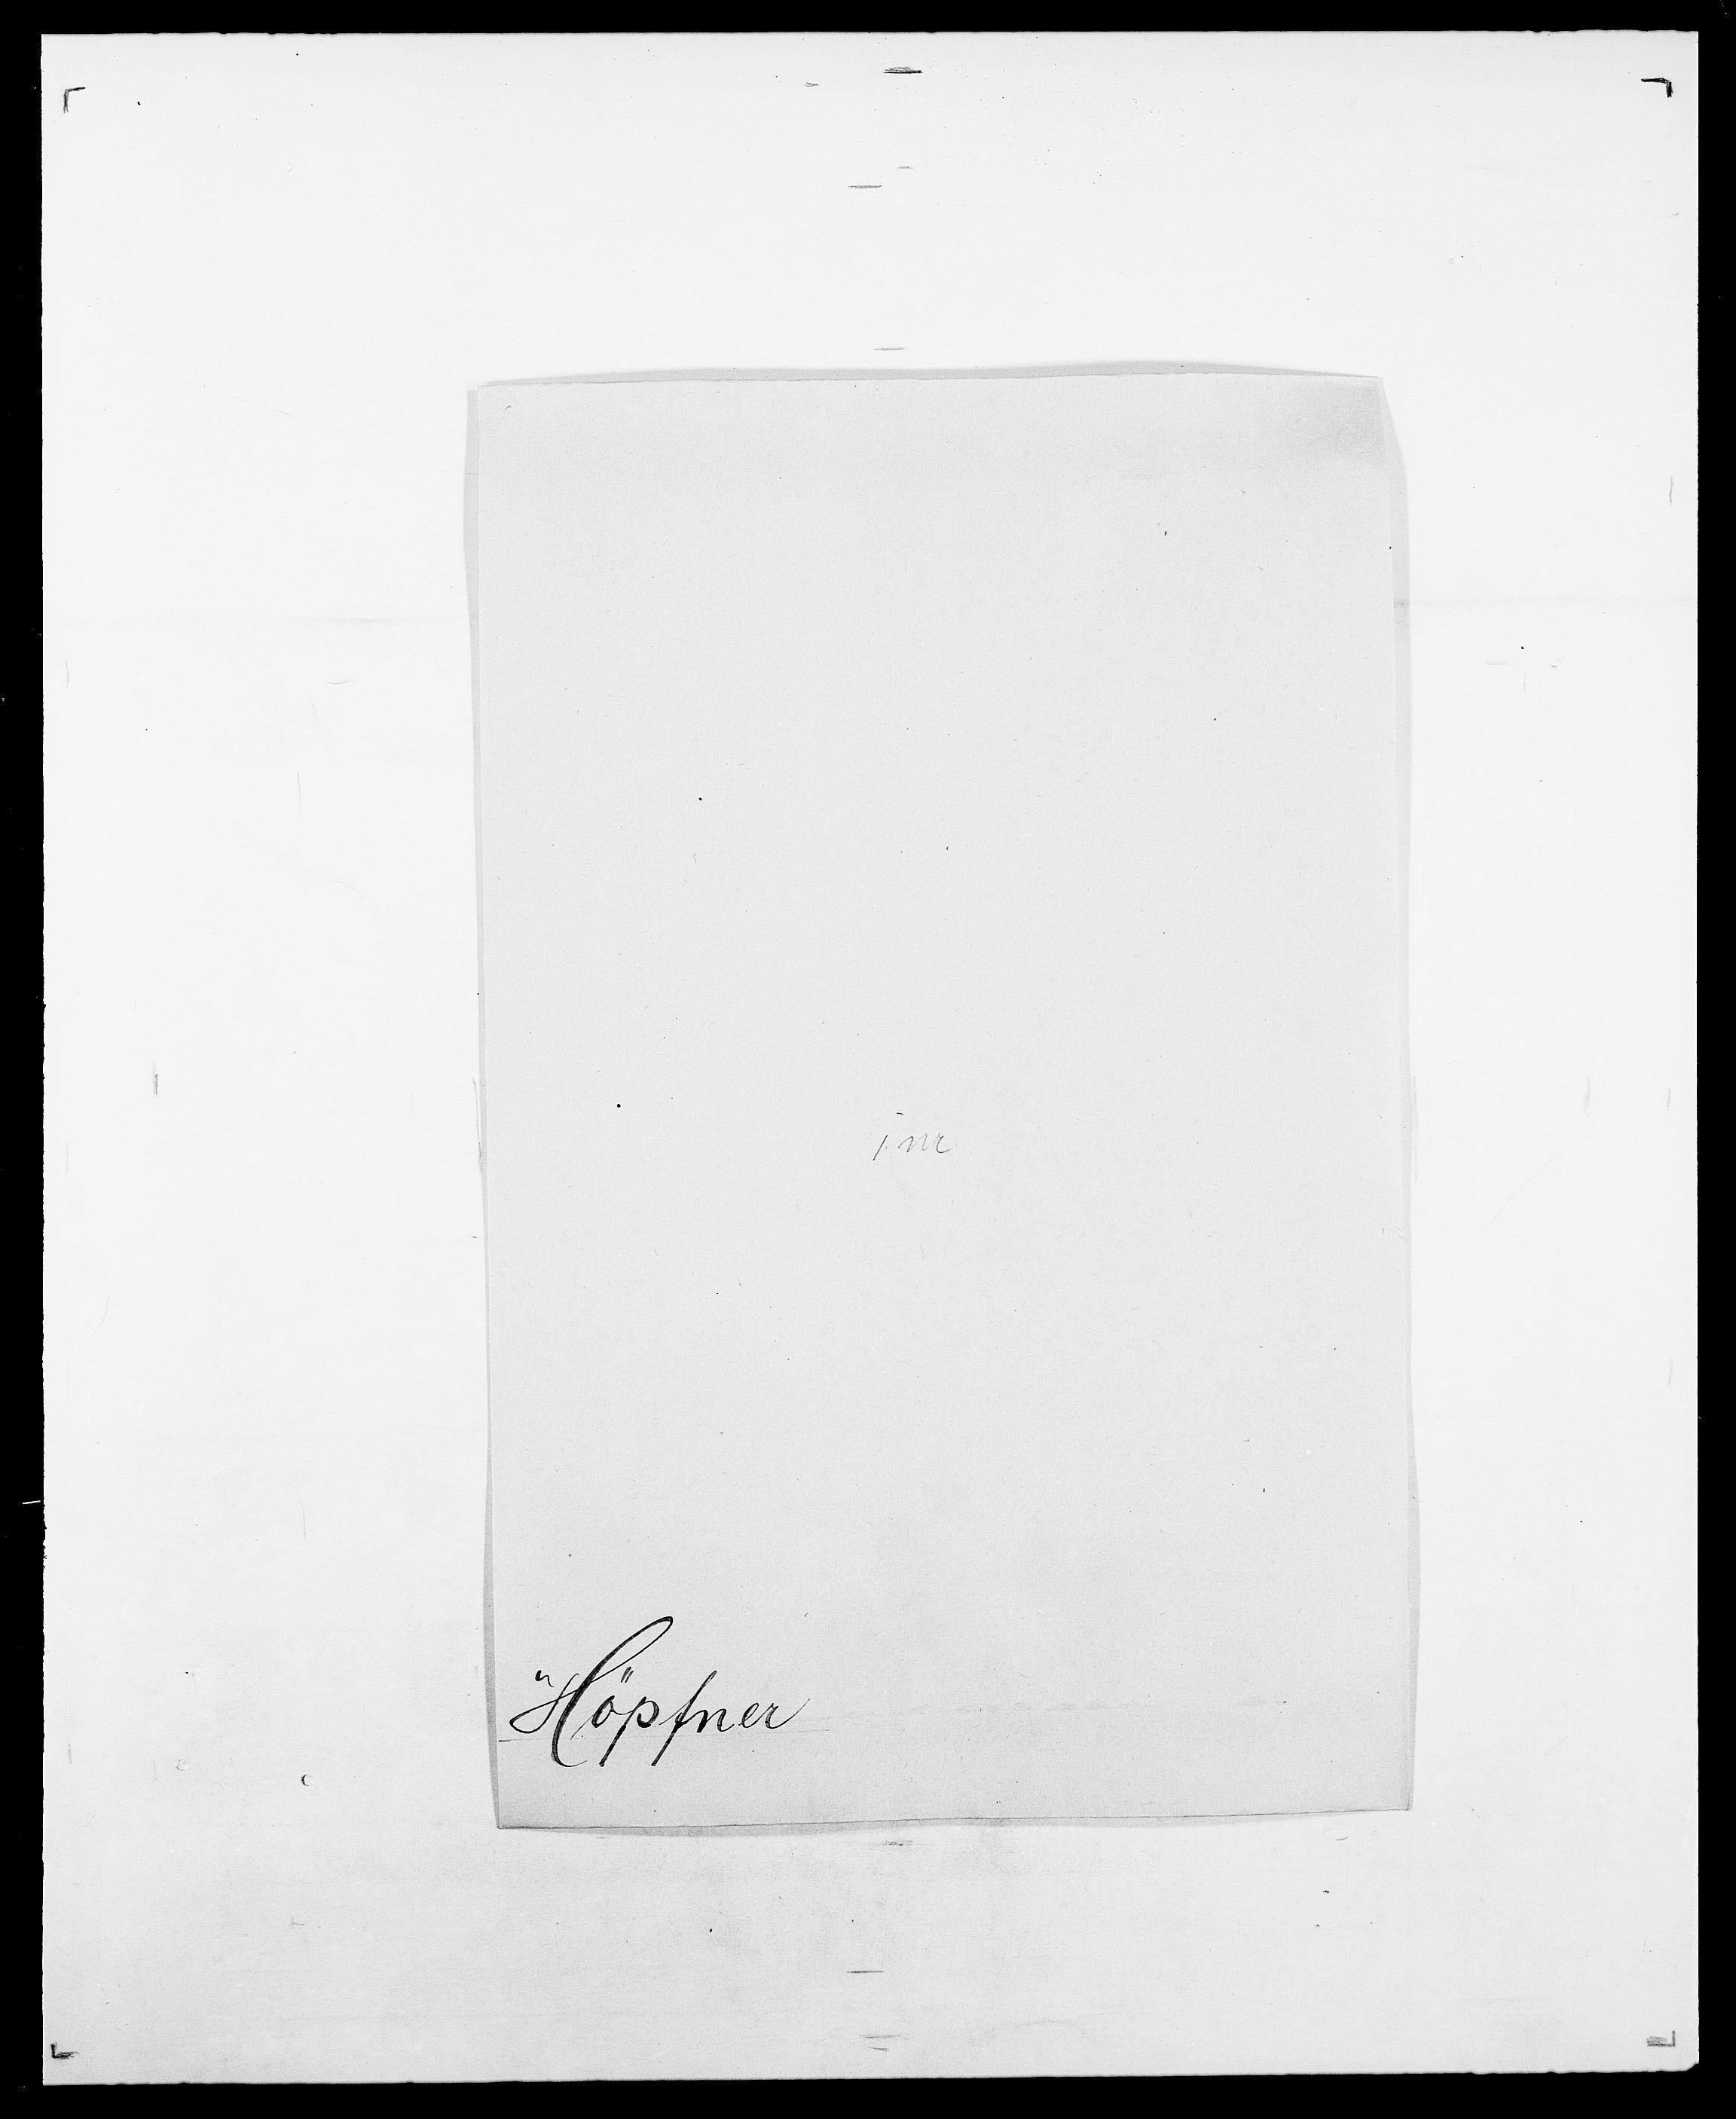 SAO, Delgobe, Charles Antoine - samling, D/Da/L0019: van der Hude - Joys, s. 371